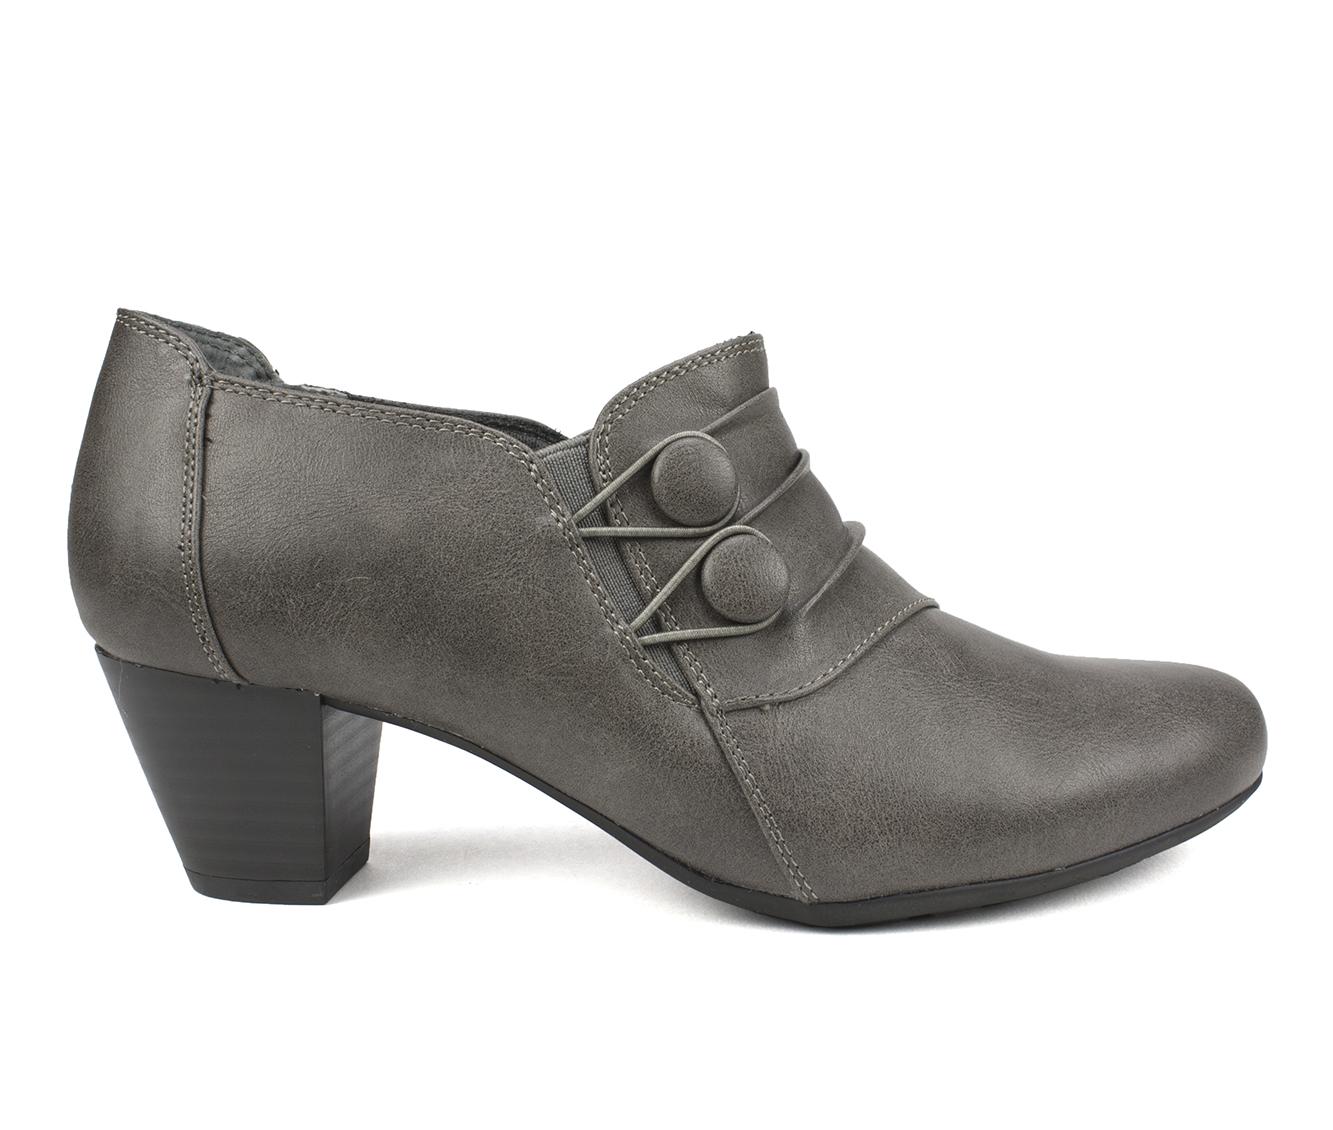 Cliffs Lampton Women's Dress Shoe (Gray Faux Leather)